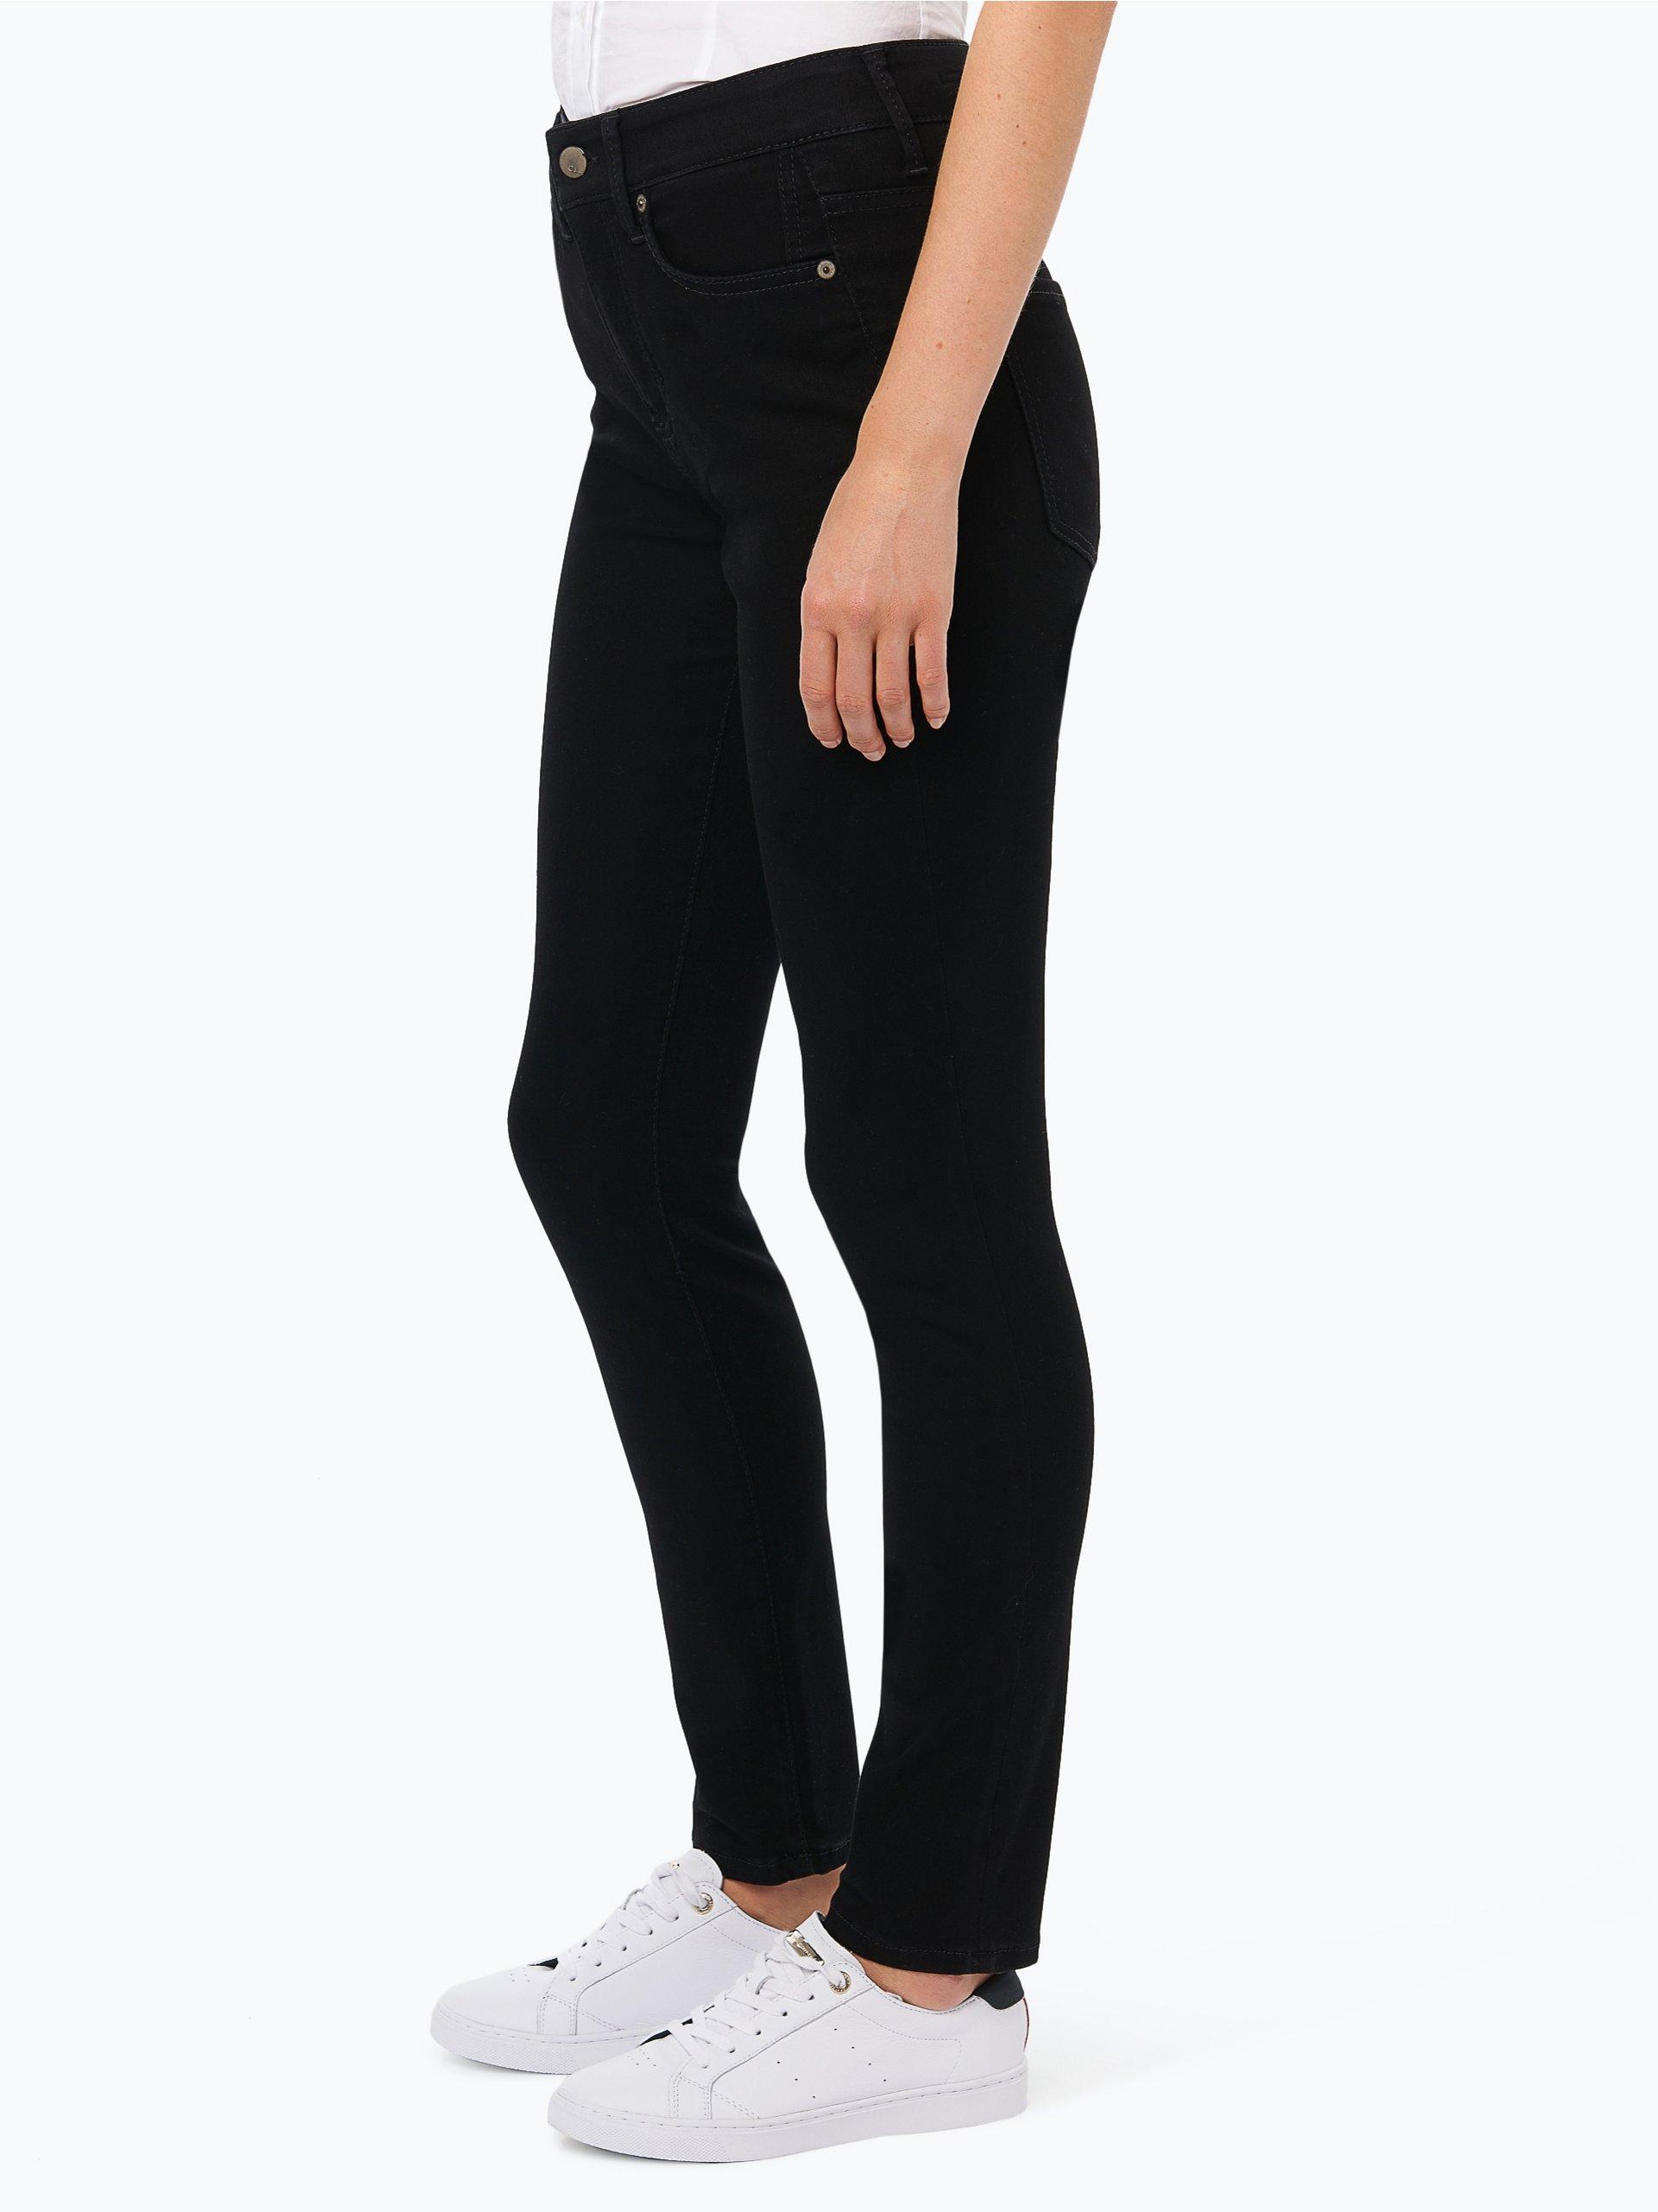 cambio damen jeans jenice schwarz uni online kaufen. Black Bedroom Furniture Sets. Home Design Ideas